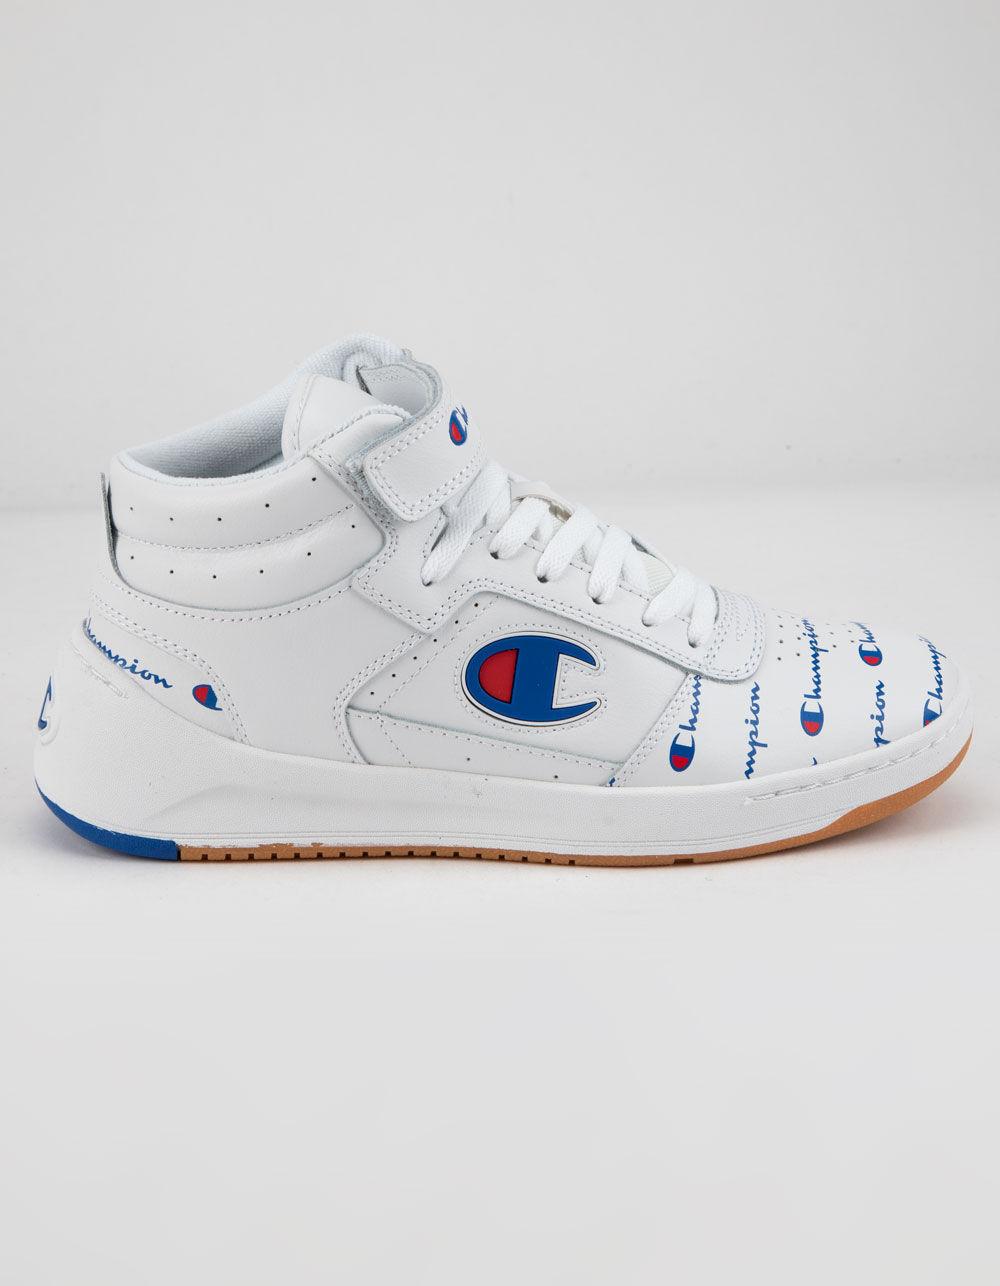 CHAMPION Super C Court Leather Print White Shoes